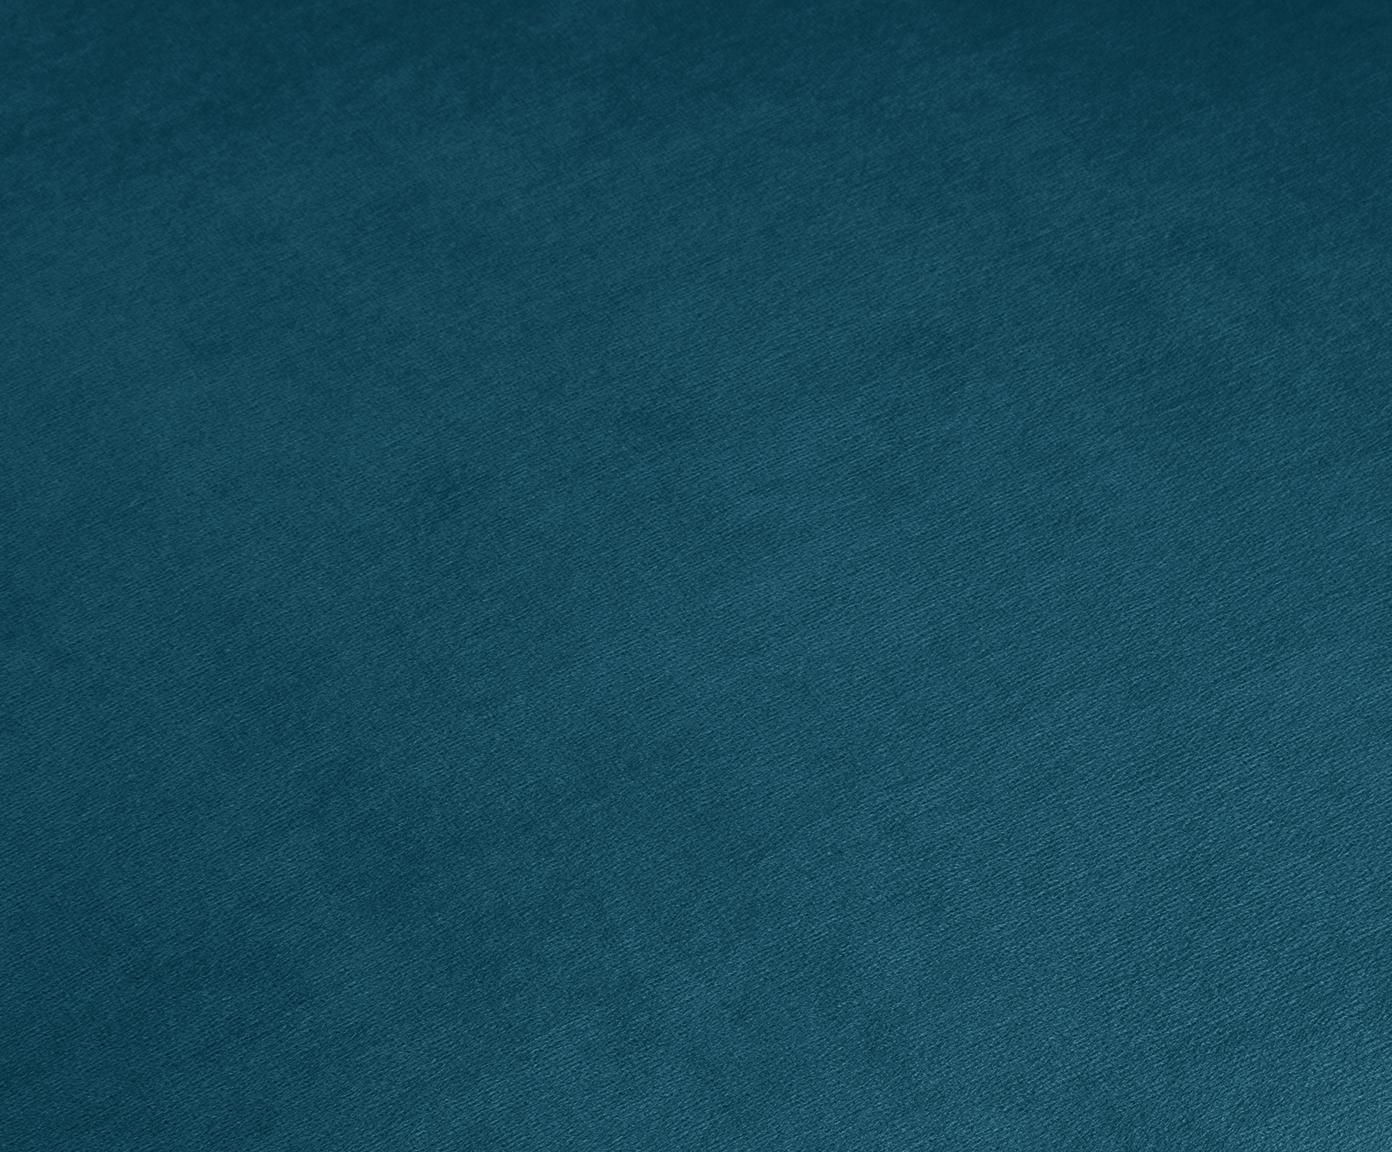 Fluwelen fauteuil Milo, Bekleding: fluweel (hoogwaardig poly, Frame: grenenhout, Poten: gelakt metaal, Petrol, 77 x 75 cm